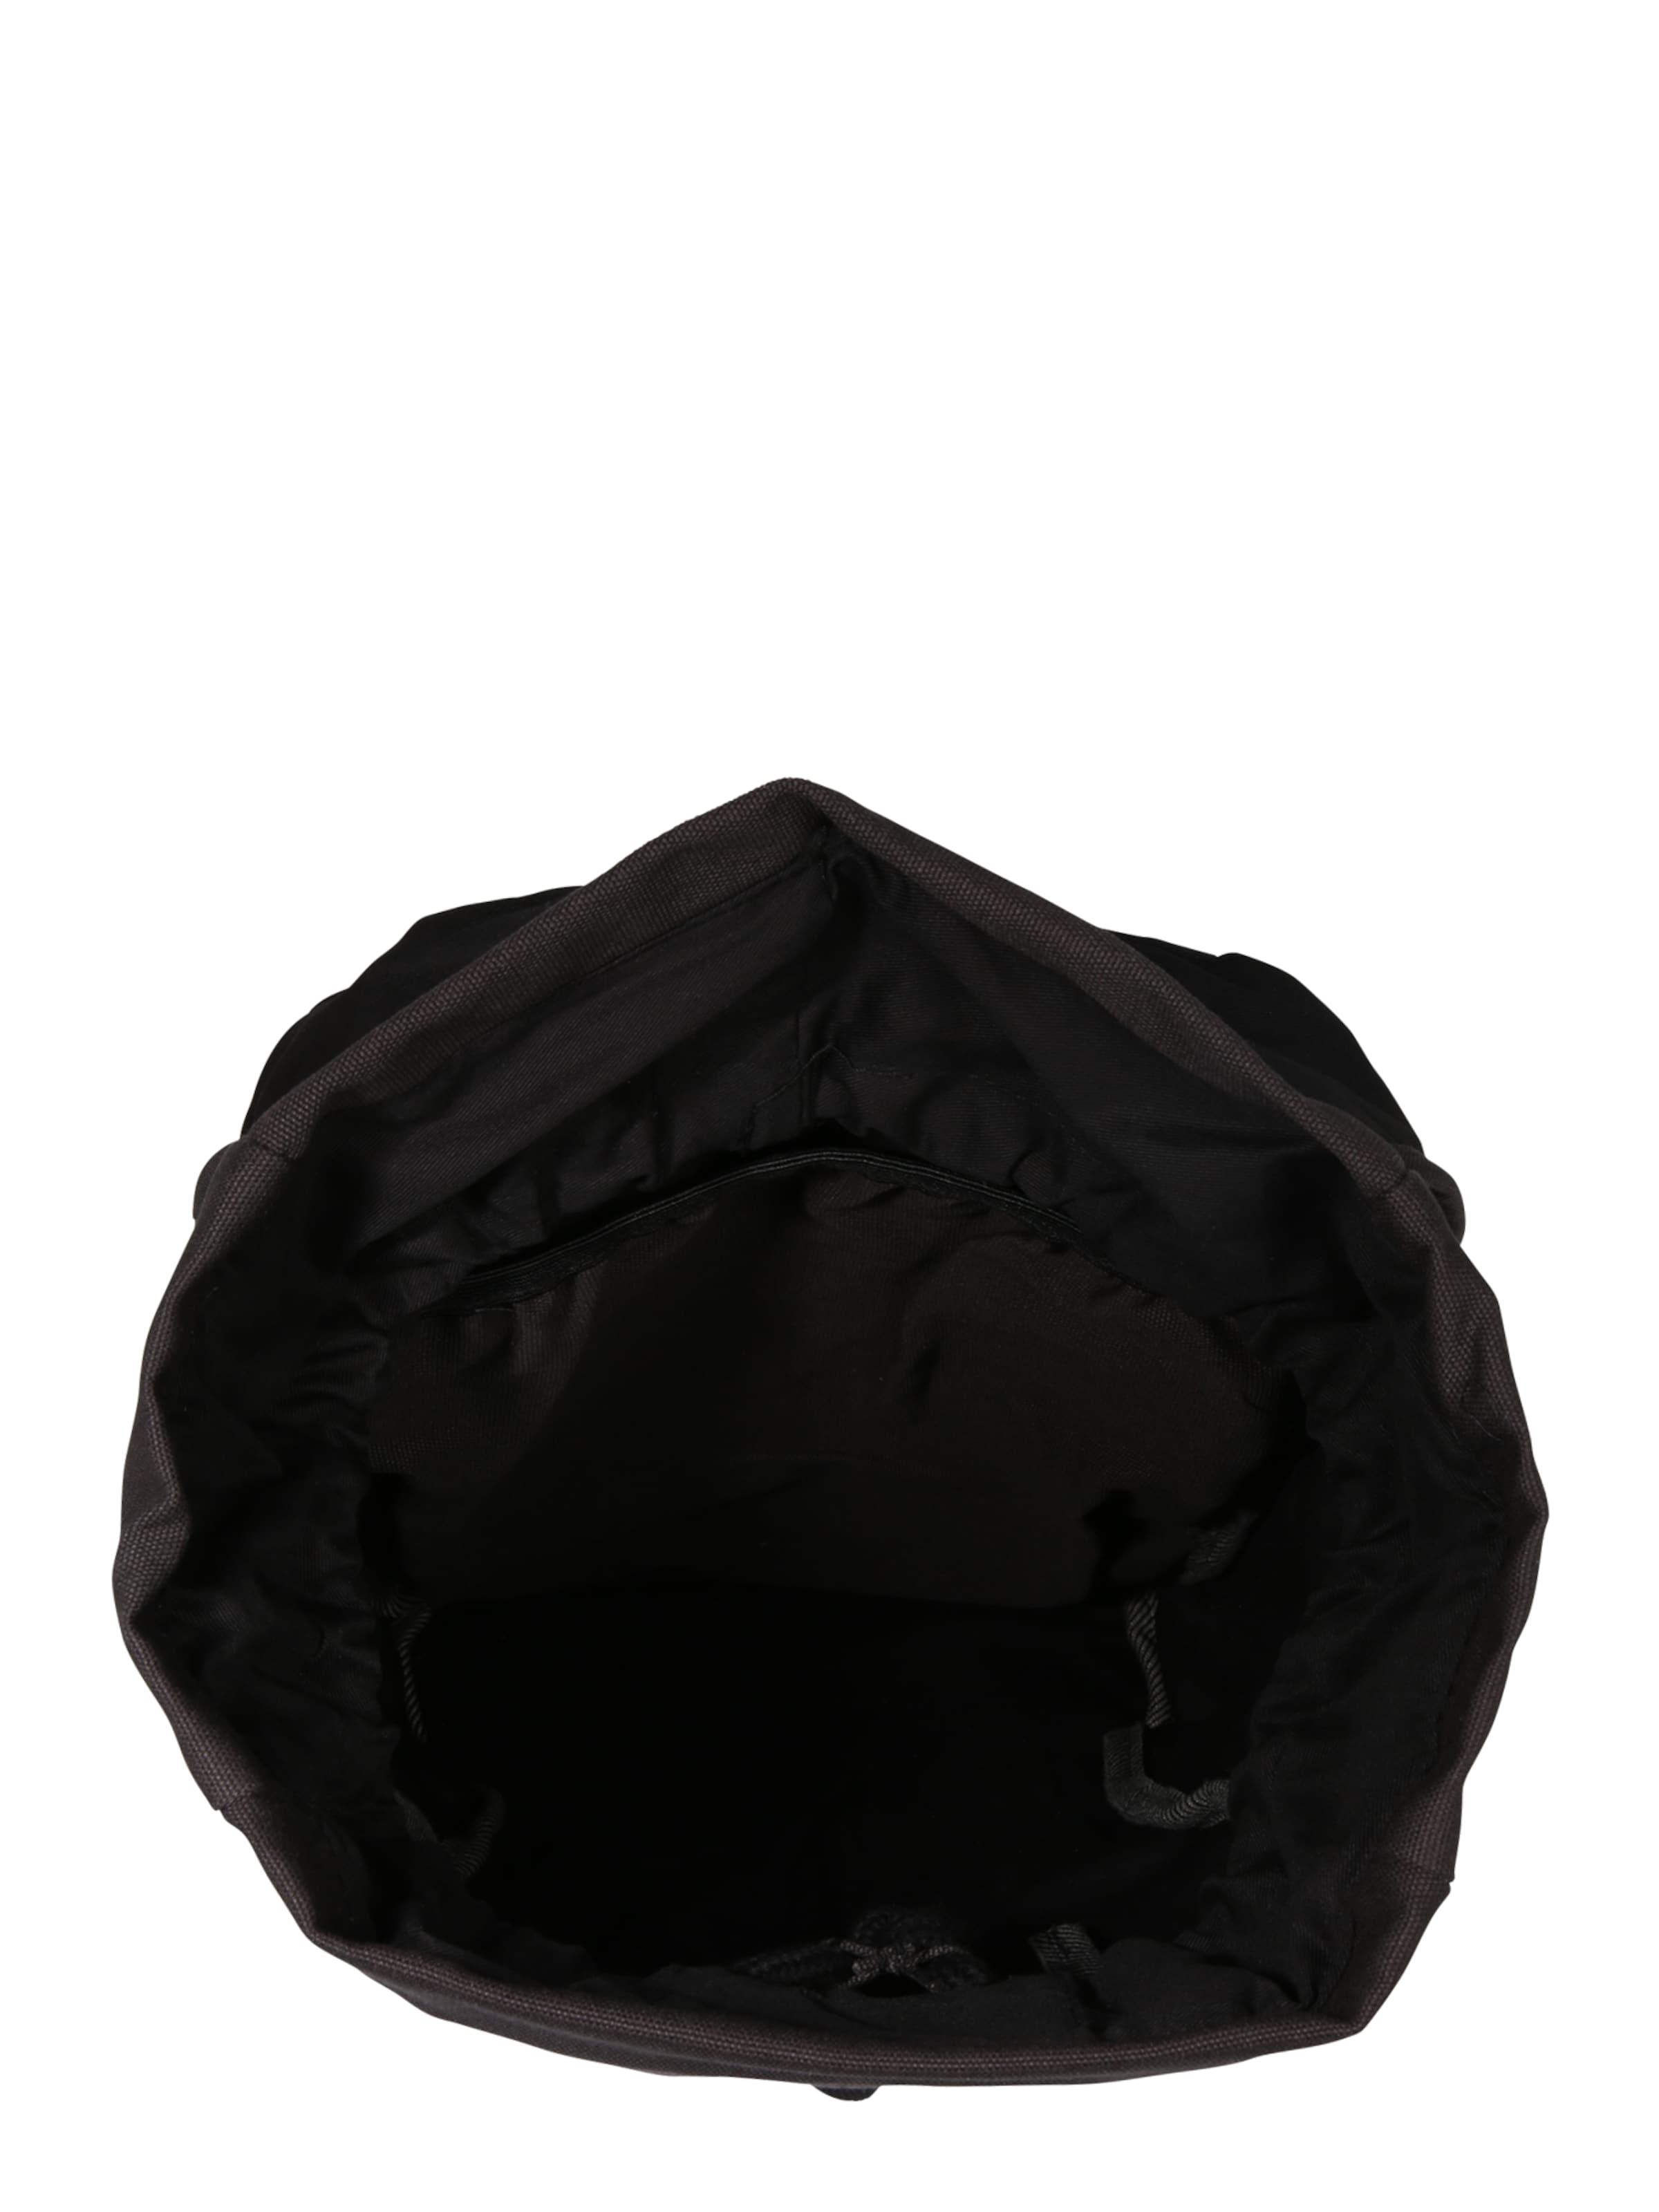 Dos 'clark' En À Forvert Noir Sac cF1TlK3J